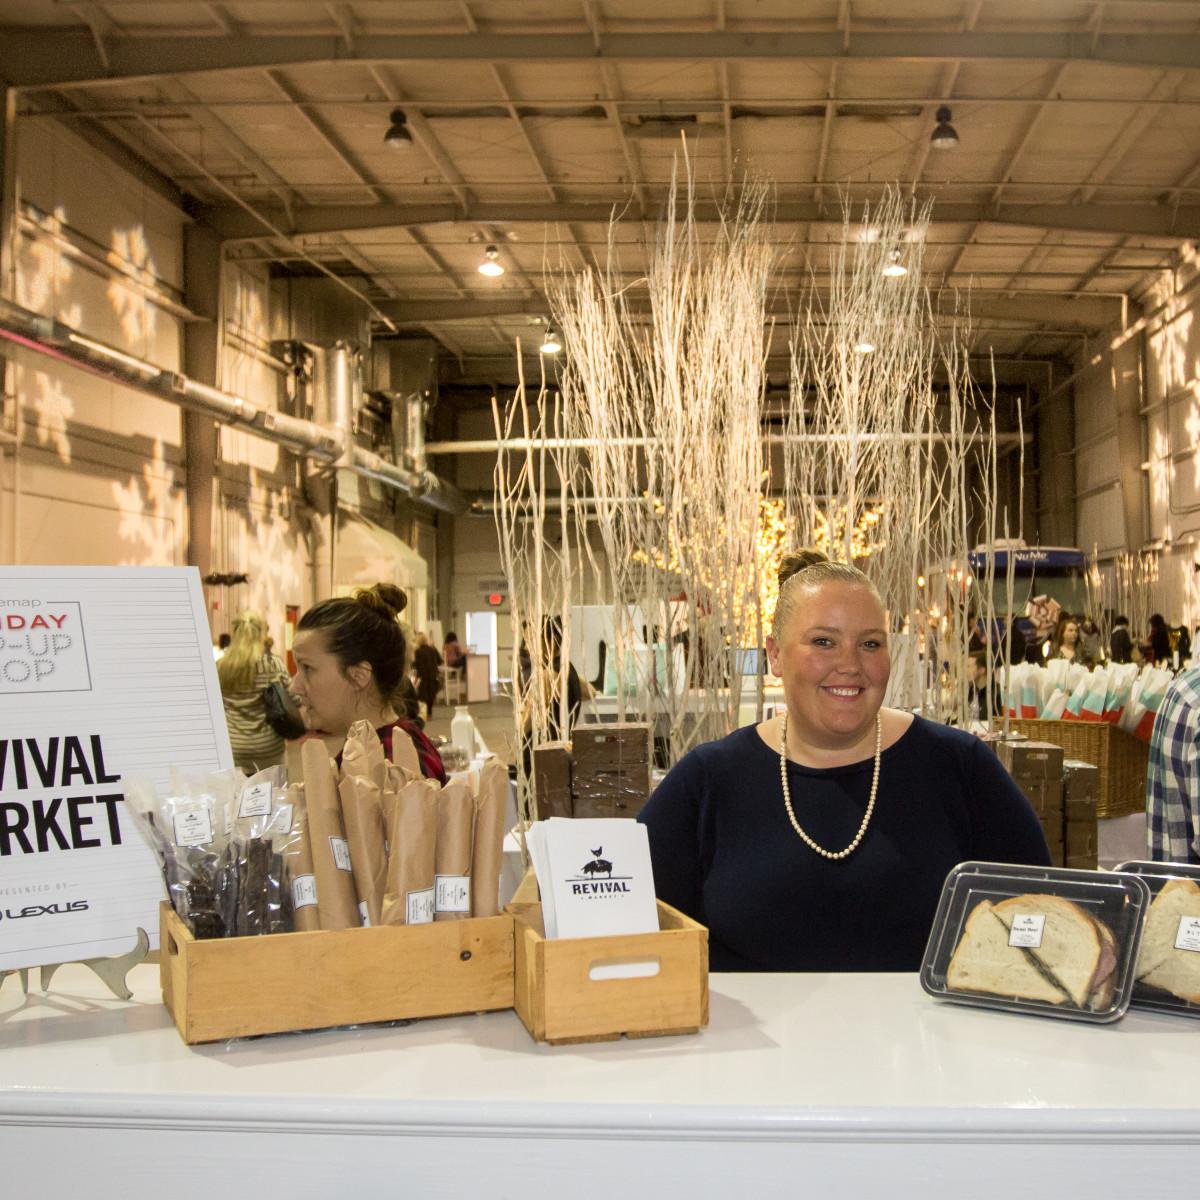 News, CM Holiday Pop-Up Shop, Dec. 2015, Revival Market